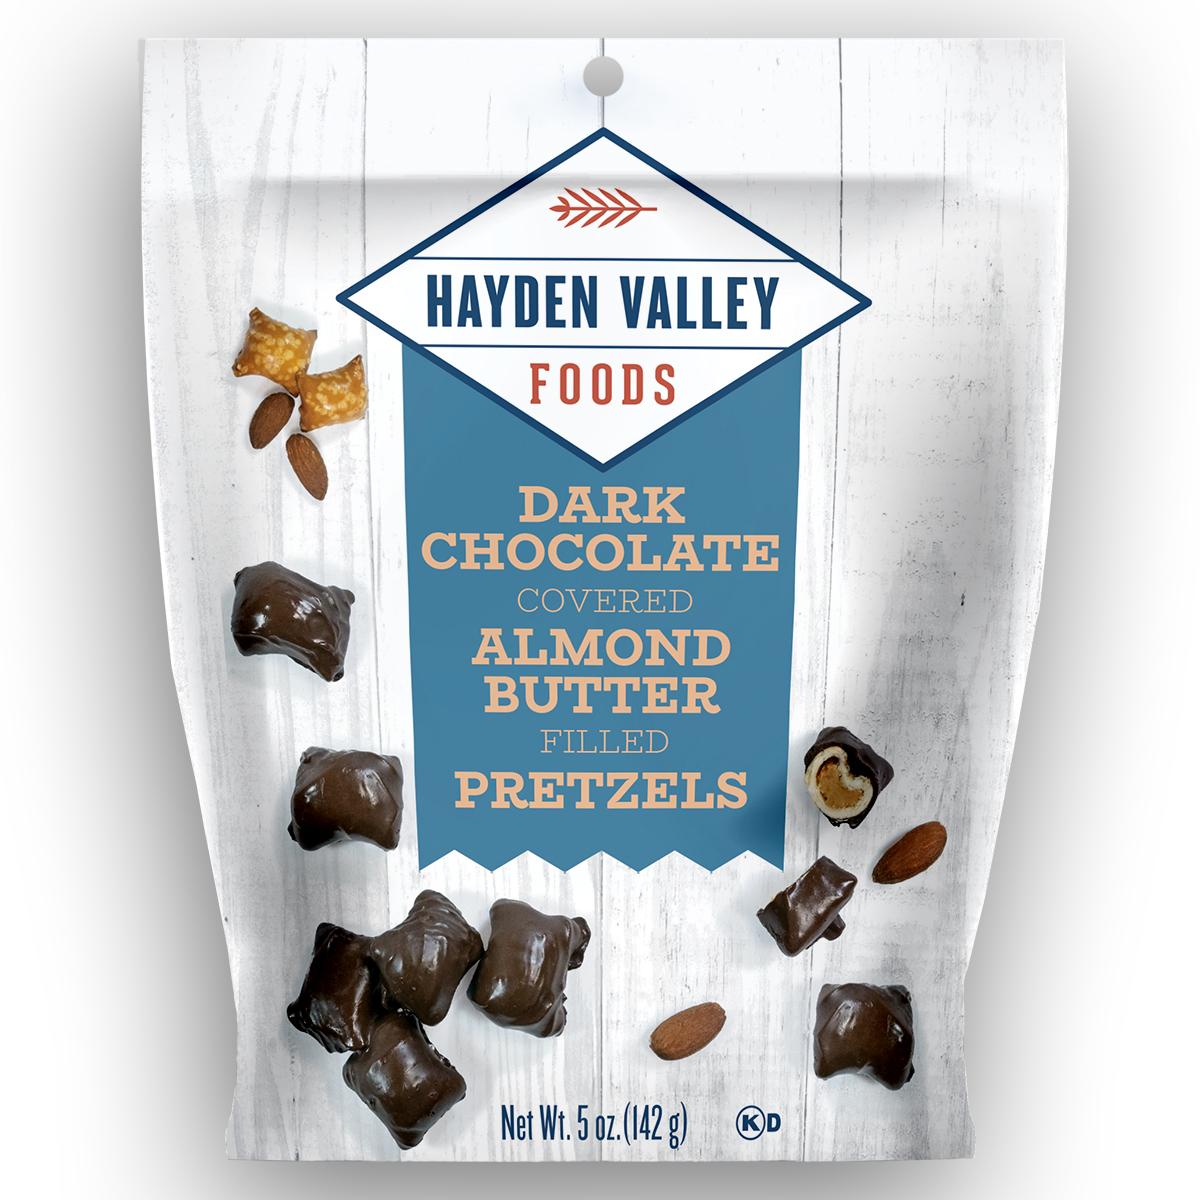 Dark Chocolate Covered Almond Butter Filled Pretzels